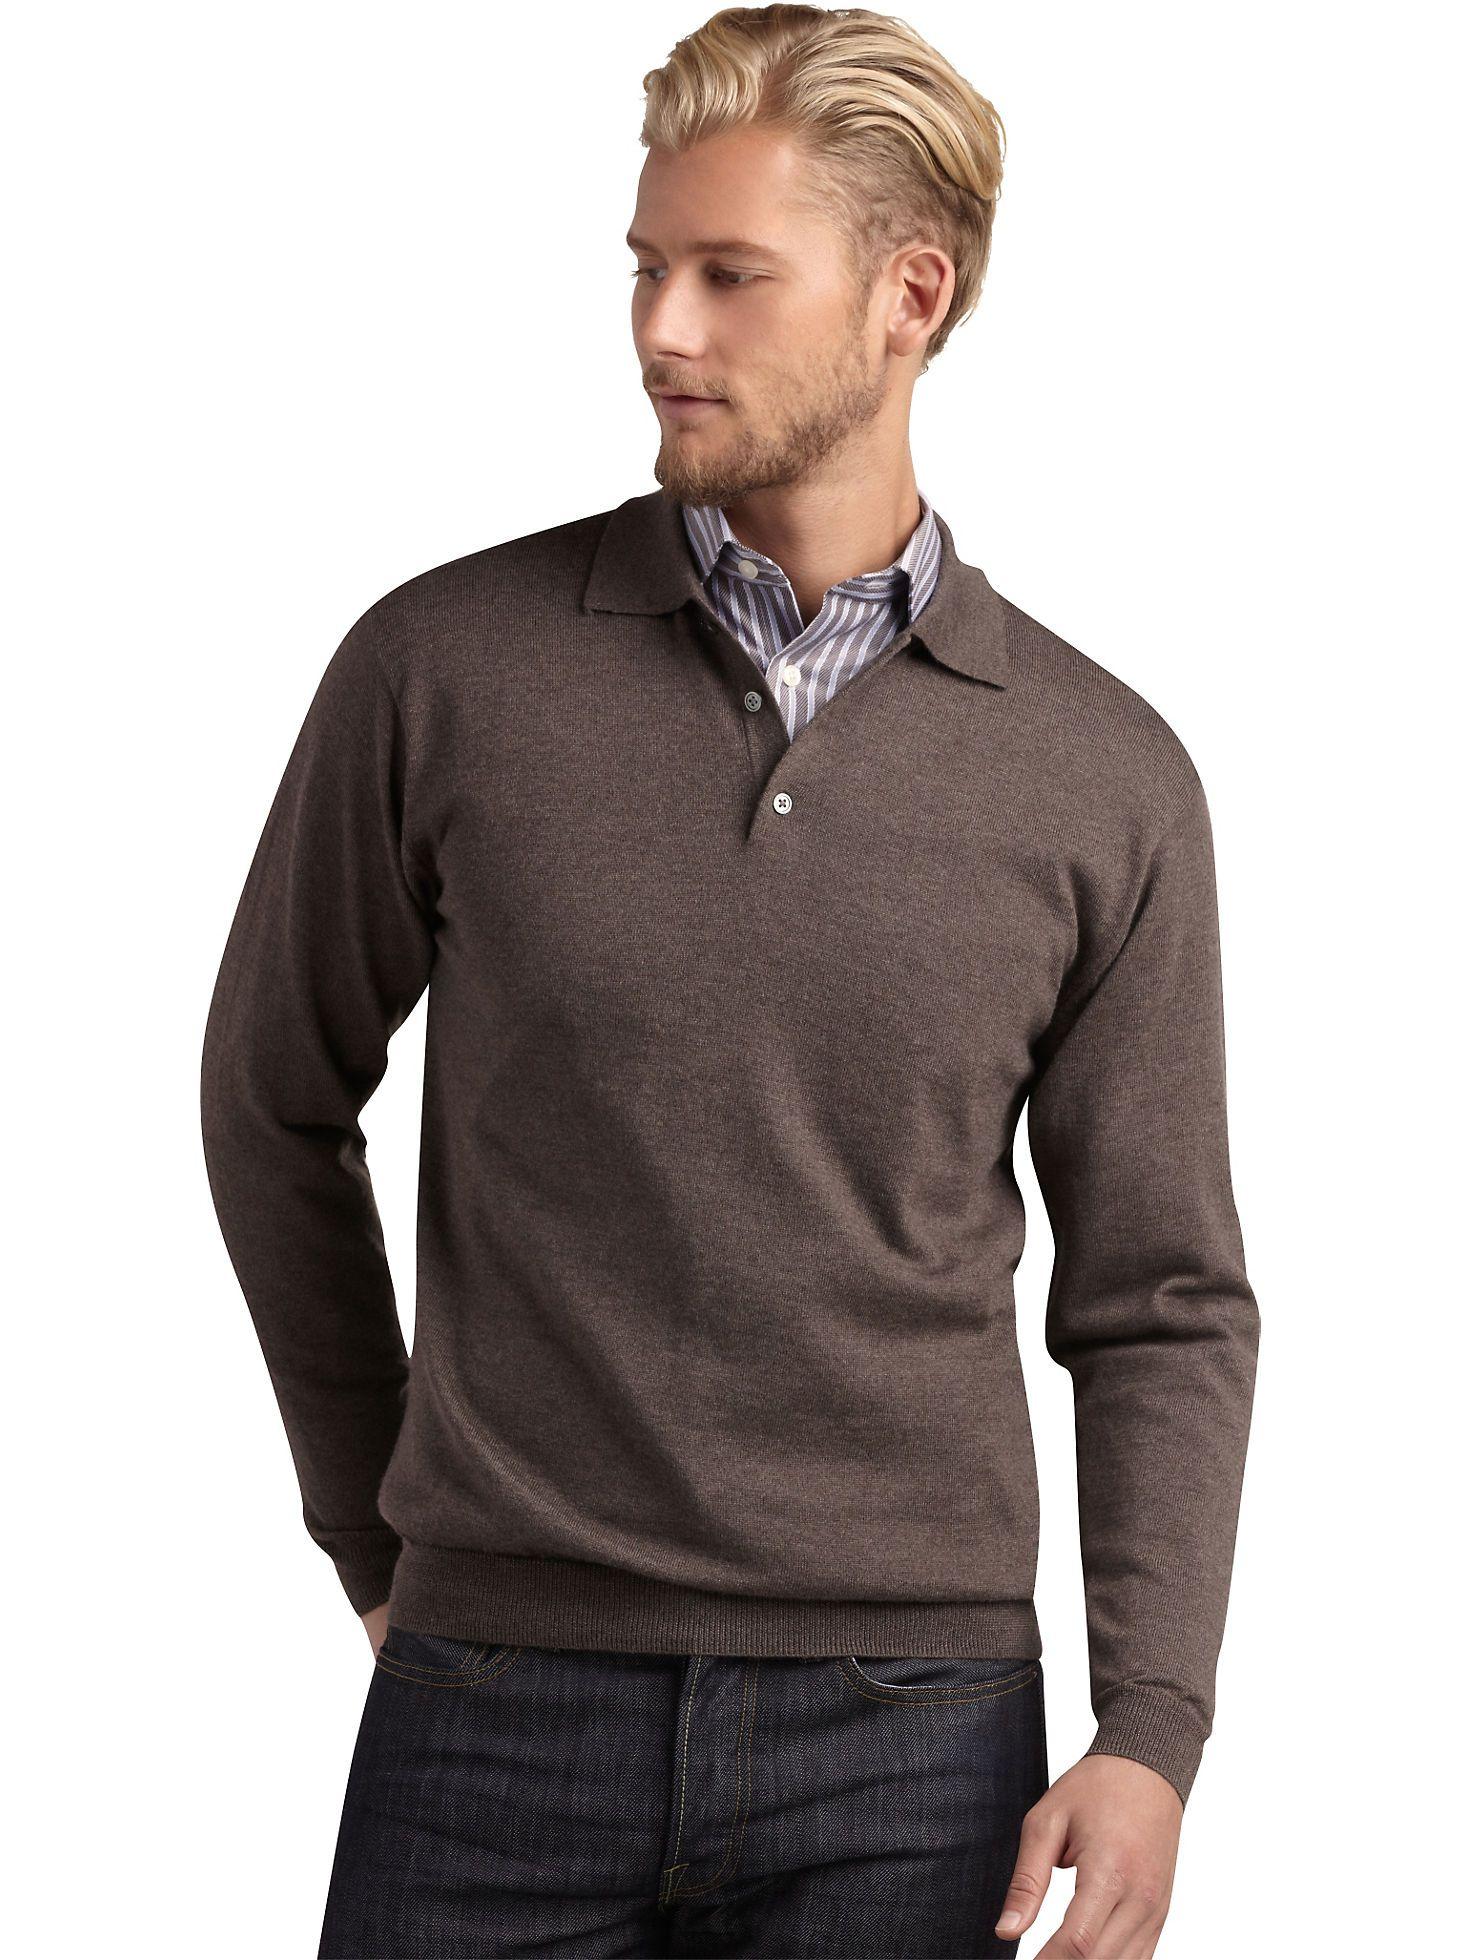 d59d04926ea Sweaters   Vests - Pronto Uomo Brown Merino Polo Sweater - Men s Wearhouse